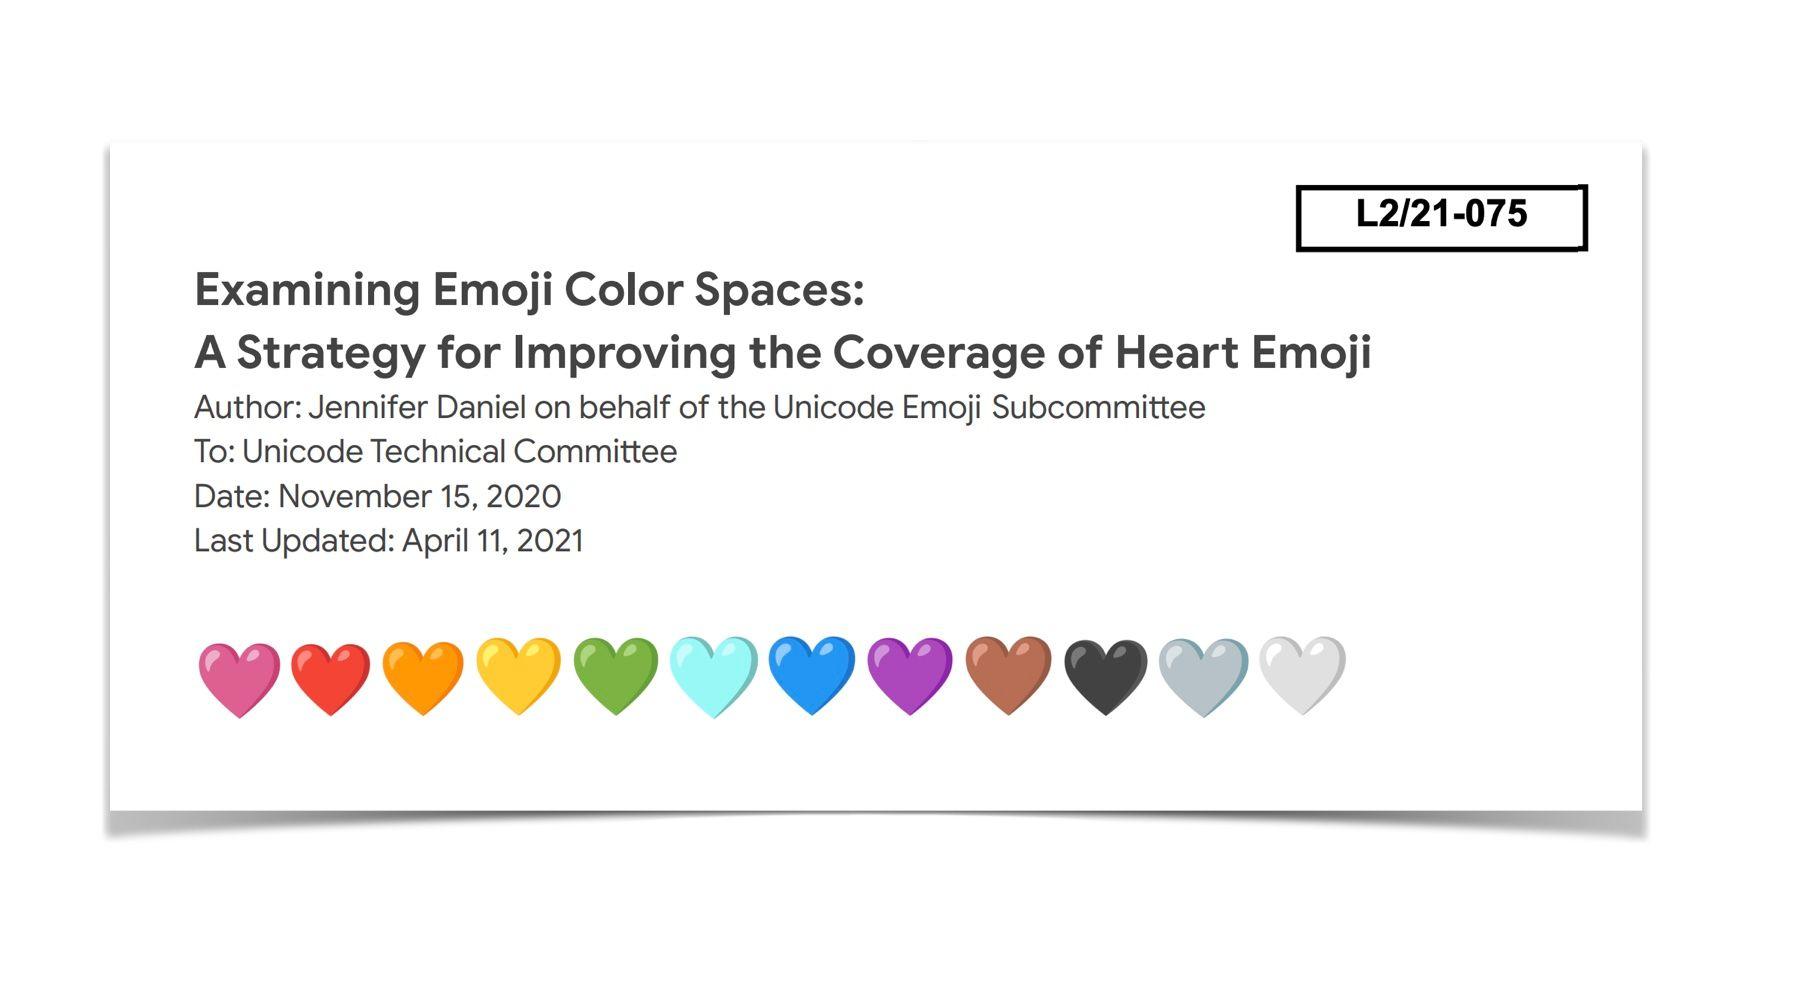 pink-heart-emoji-2022-emojipedia-unicode